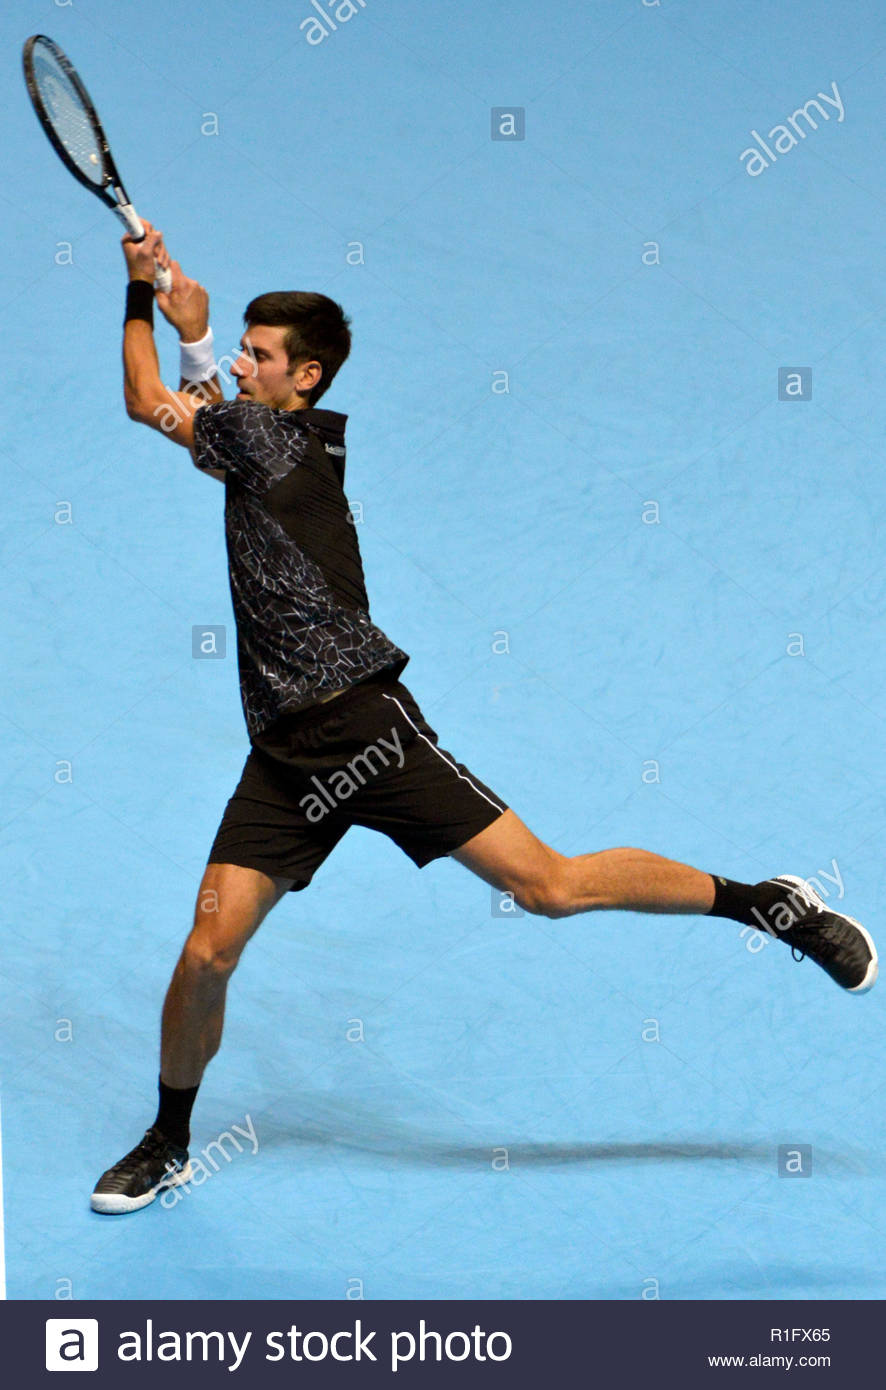 London UK 12th November 2018 Nitto ATP World Tour Finals at 02 Arena London UK Novak Djokovic SRB Vs John Isner USA Djokovic in action during the match Credit: Leo Mason Photos/Alamy Live News Stock Photo